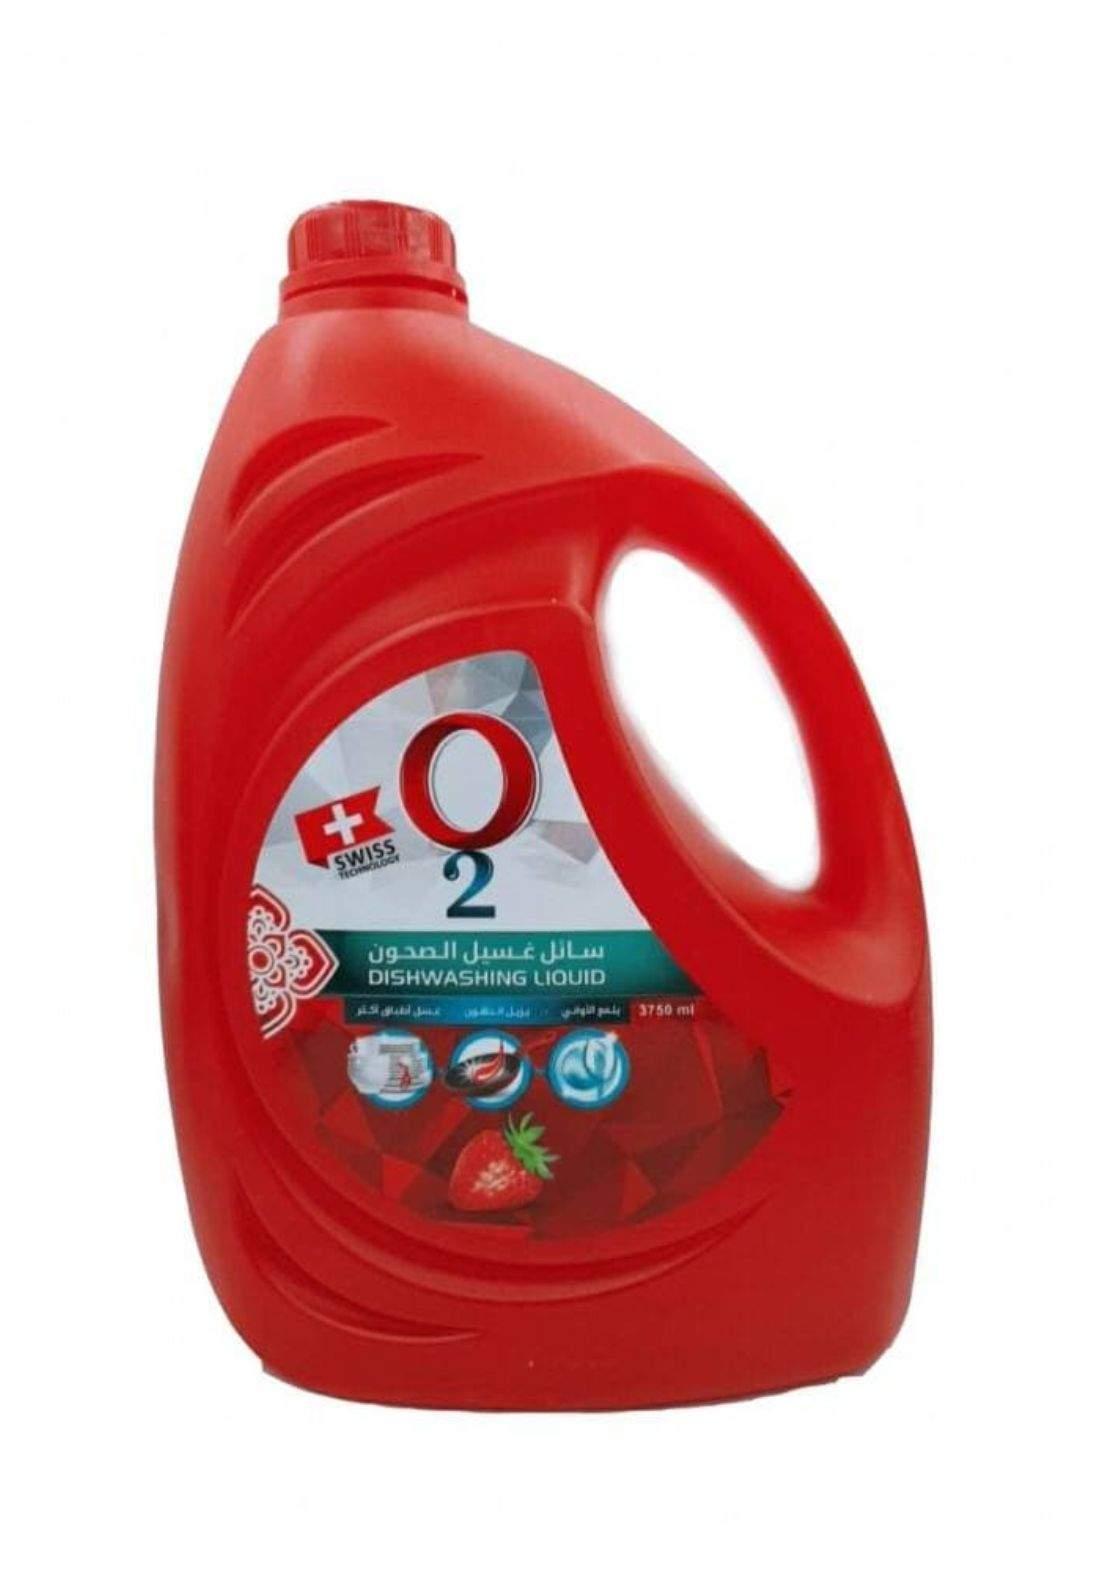 O2 Dishwashing liquid 3750 mlاوتو  سائل التنظيف الاواني